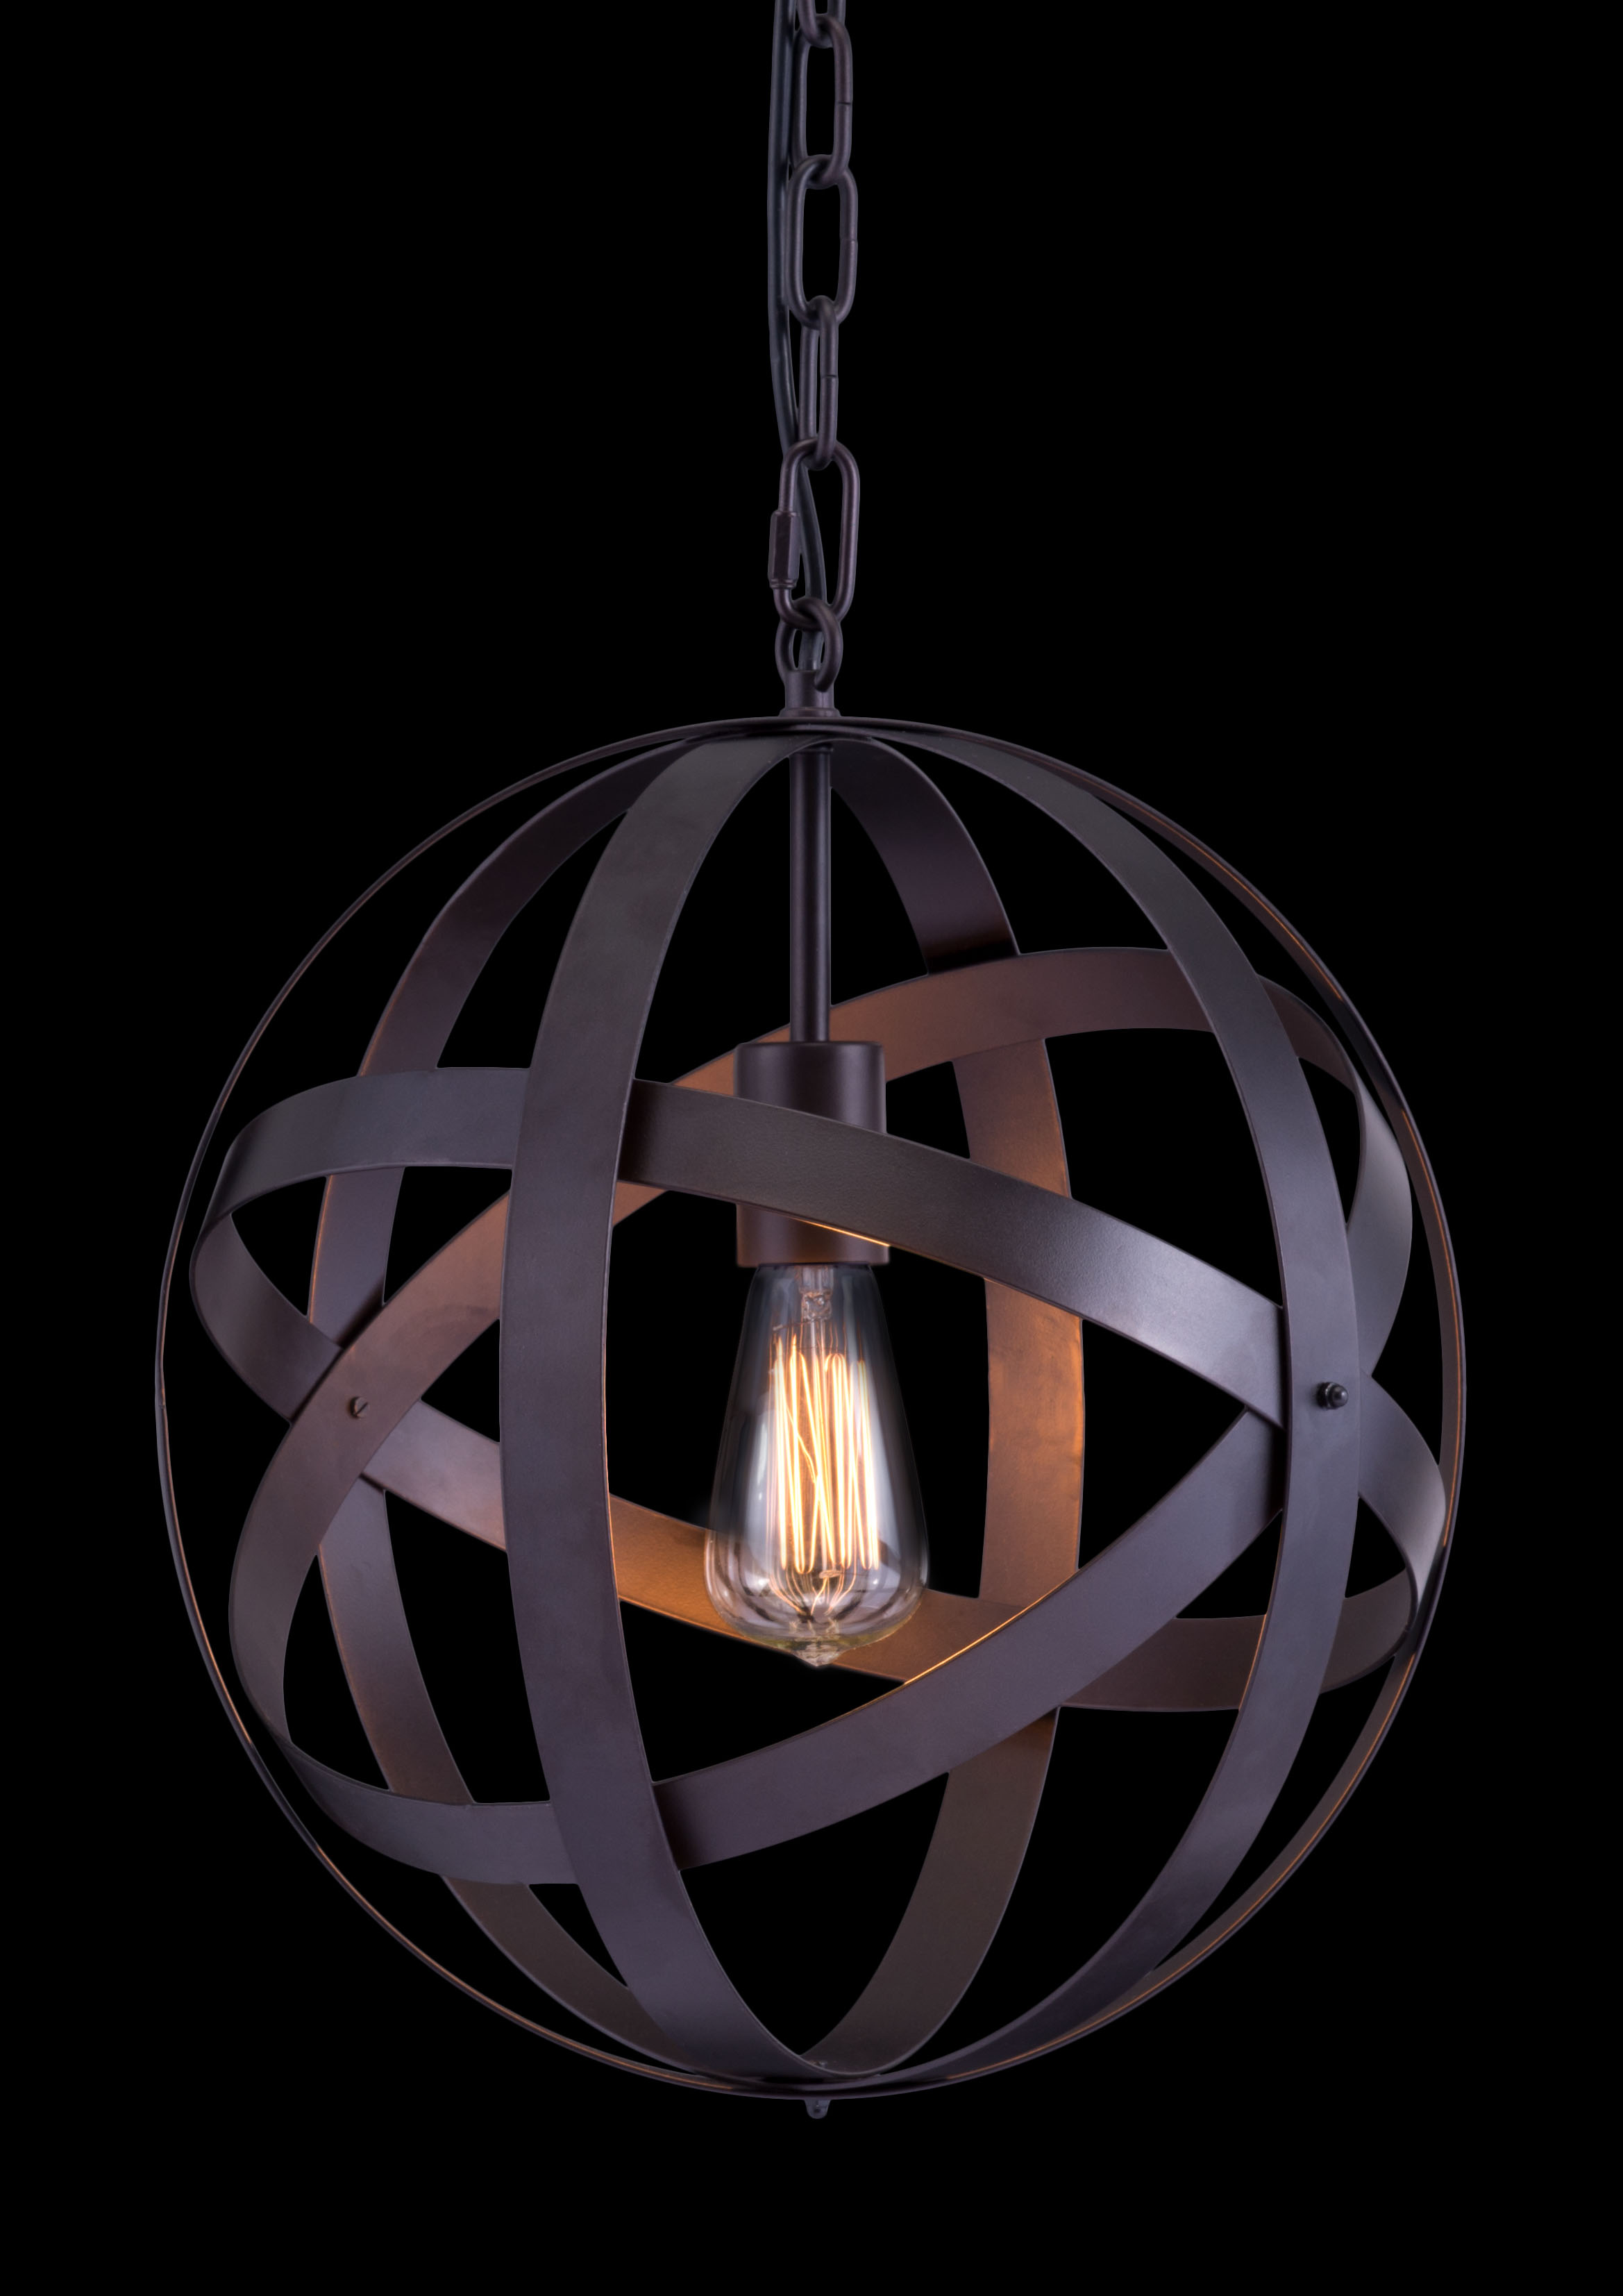 plymouth-ceiling-lamp.jpg